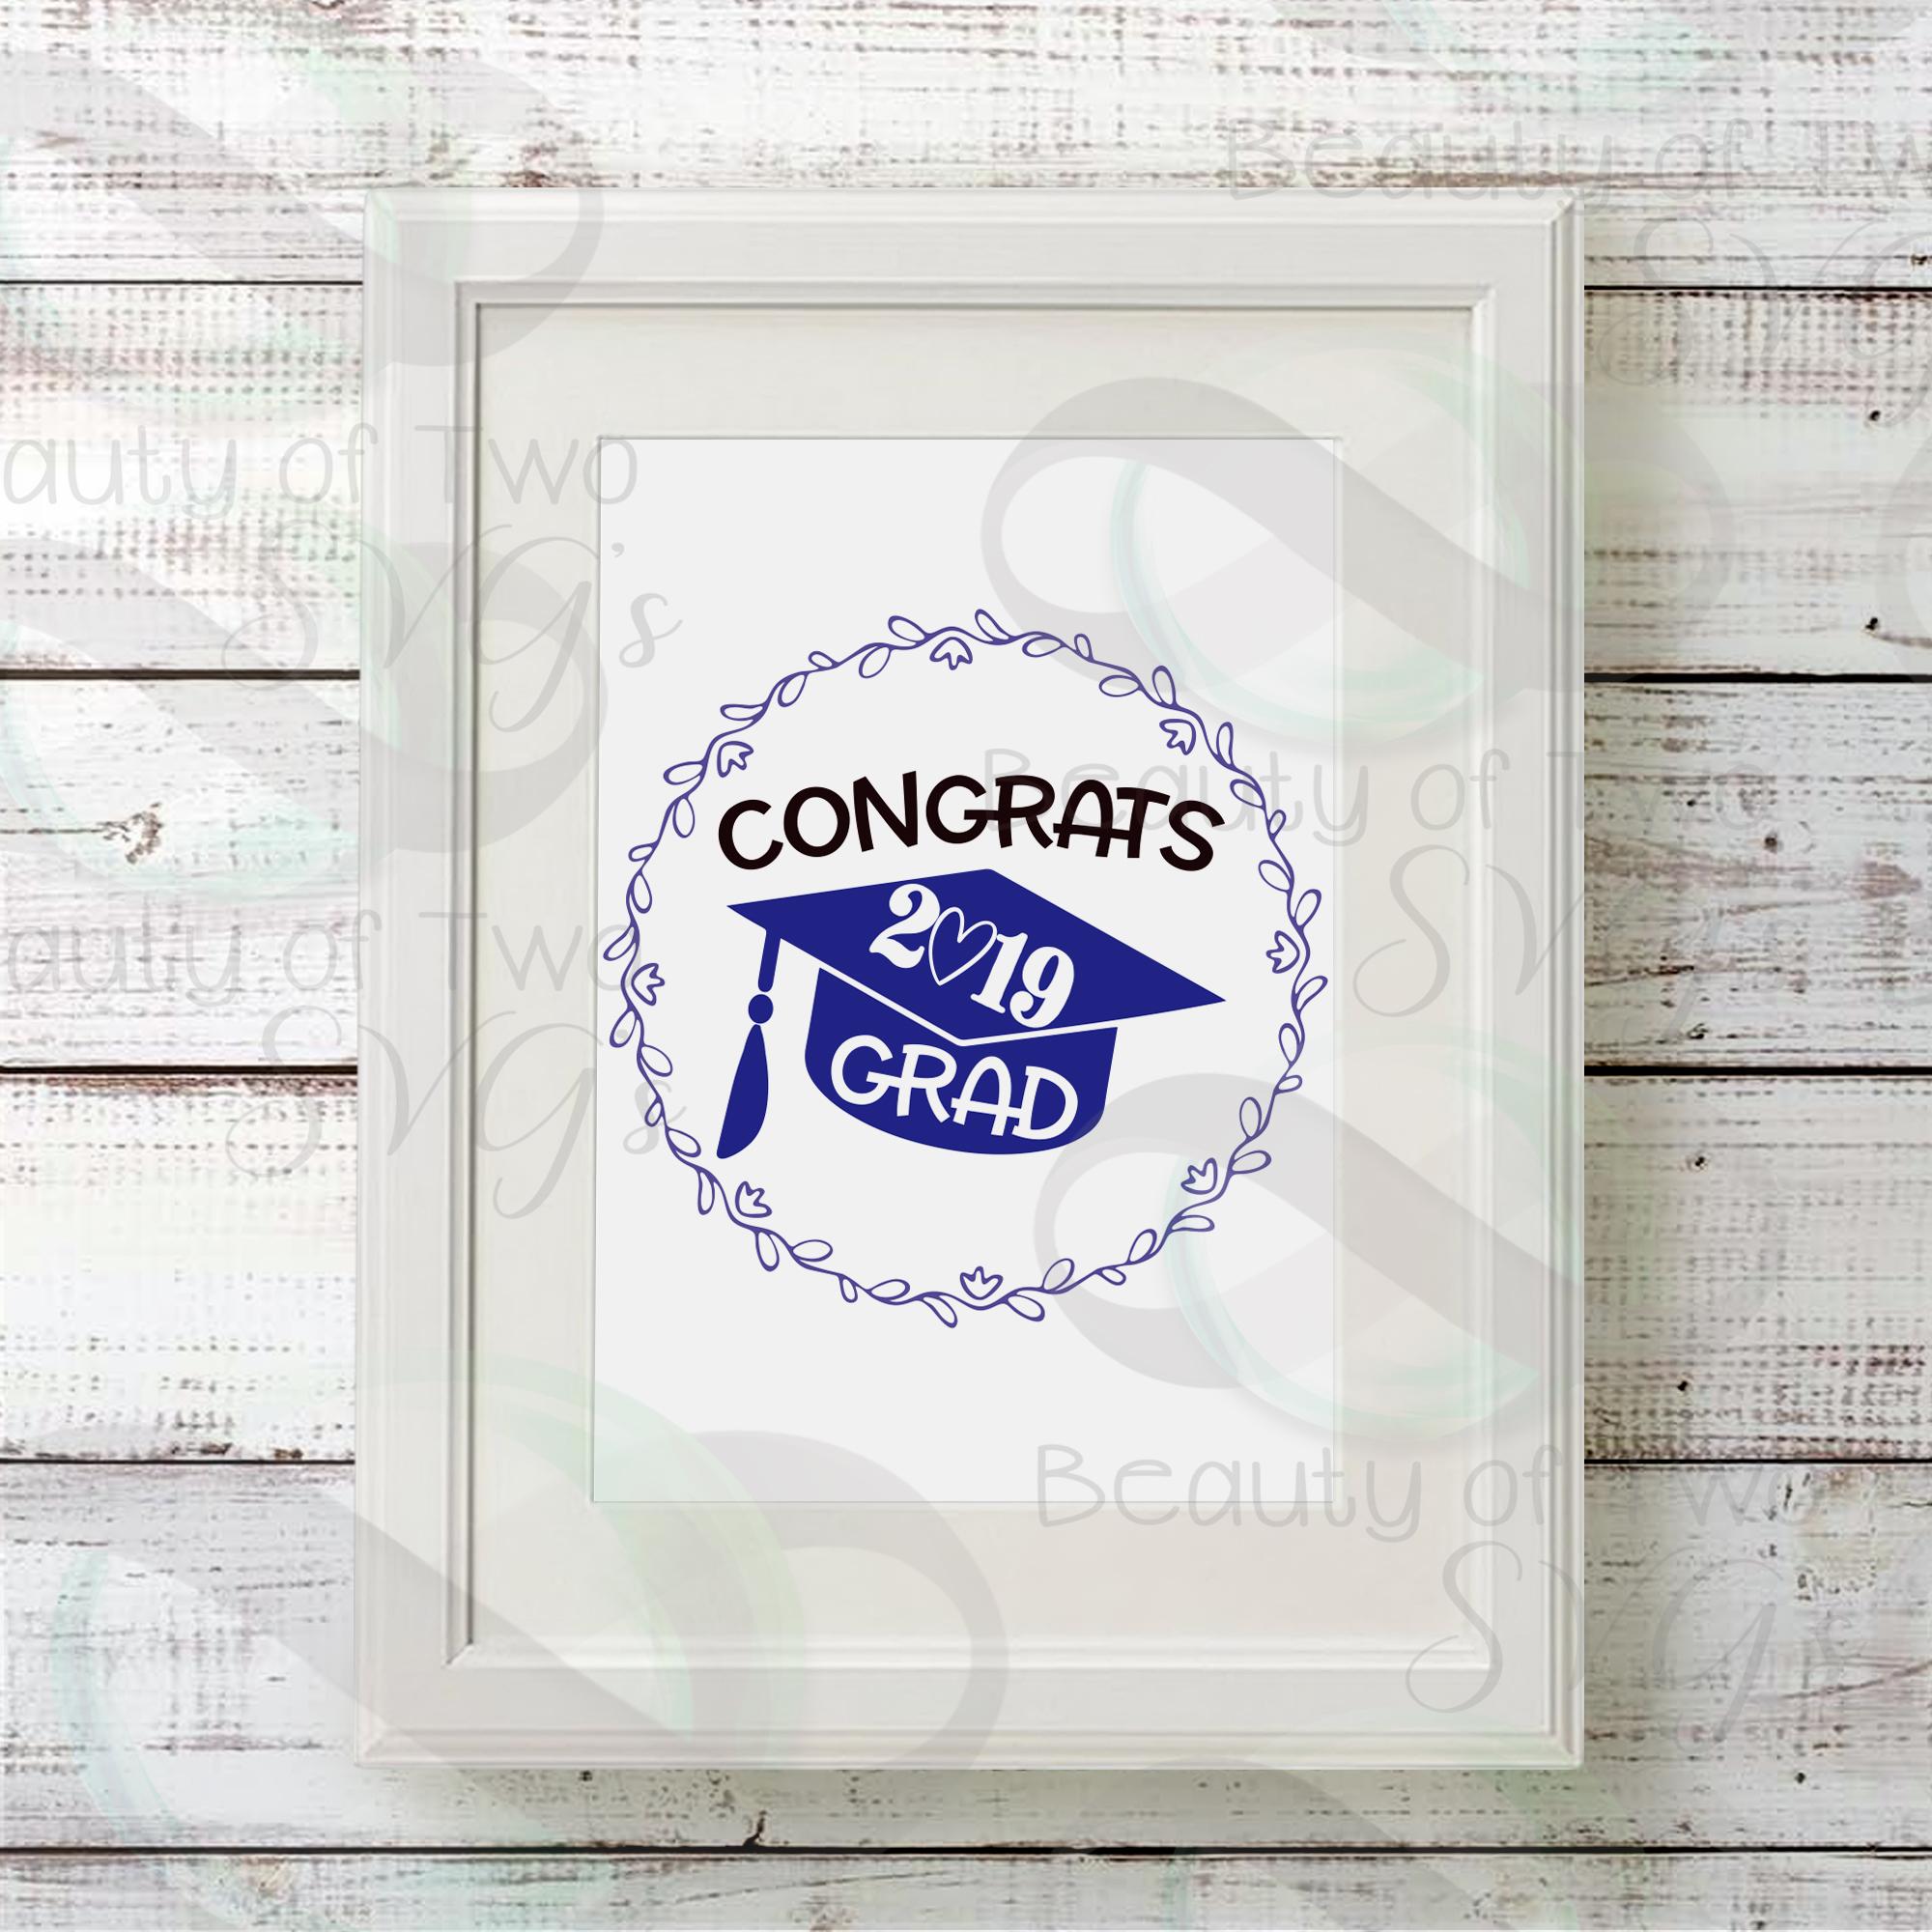 2019 Grad svg and png, Congrats 2019 Graduate svg example image 2